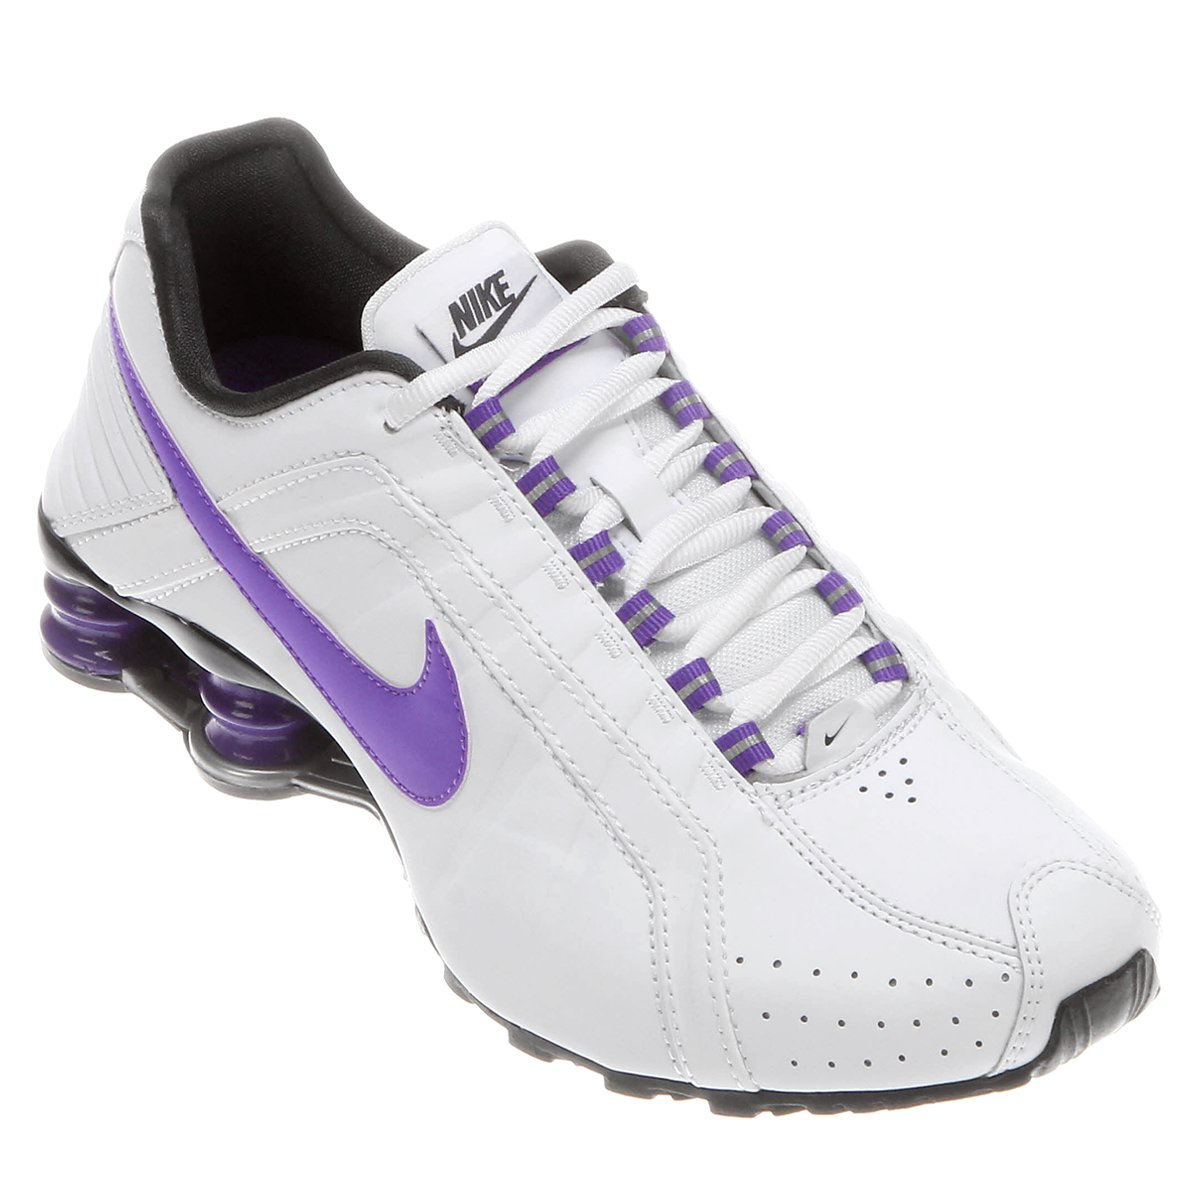 finest selection 8ae23 37649 ... sale tênis nike shox junior branco fae98 85f41 ...